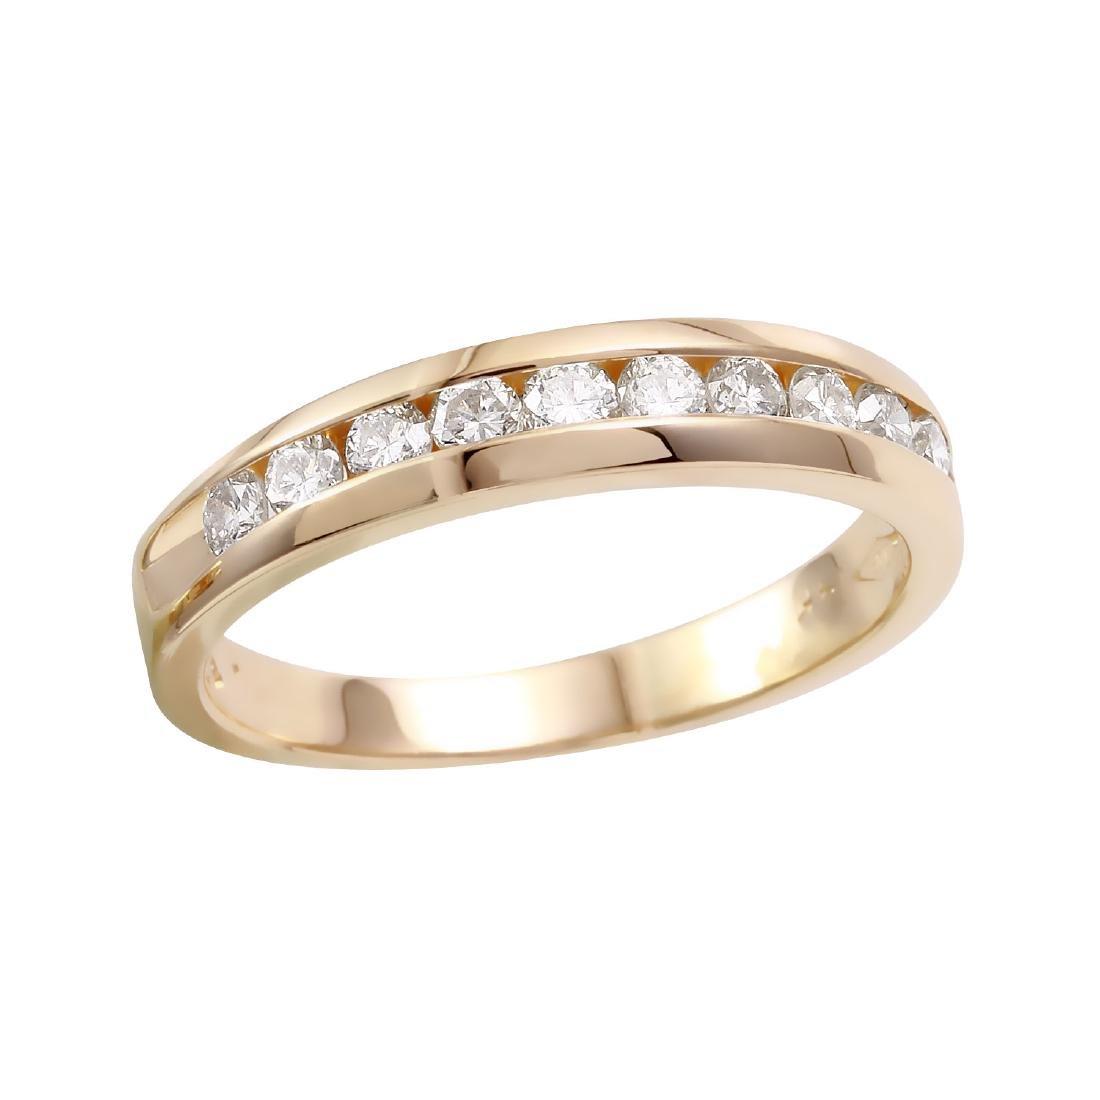 14KT Yellow Gold 0.45ctw Diamond Wedding Band Size 6.25